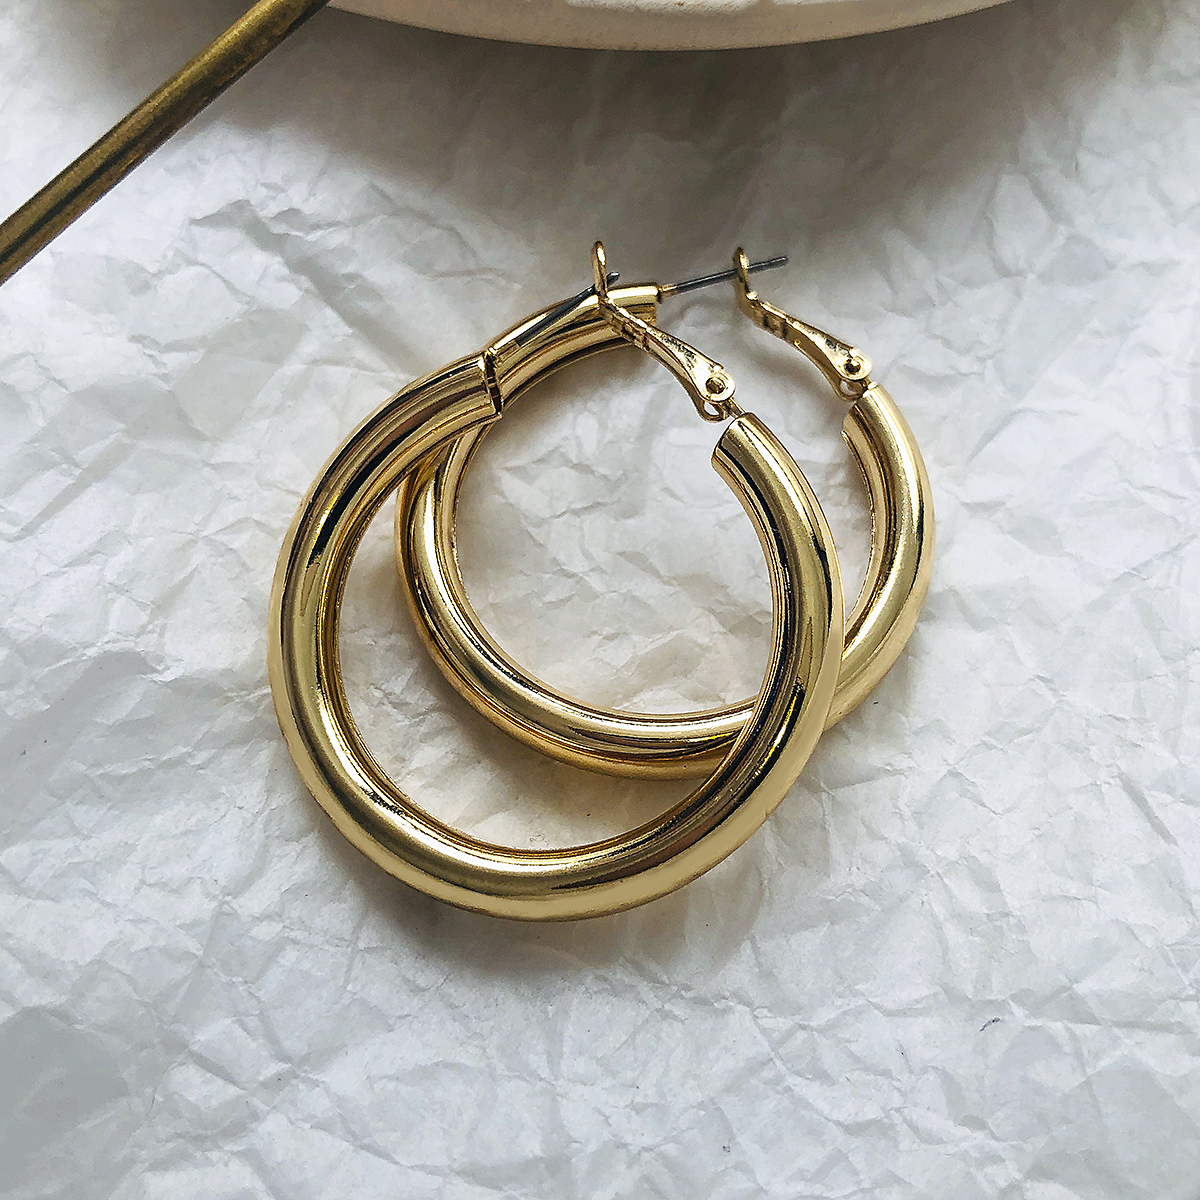 Oversize Hoop Earrings For Women Wide Big Metal Round Circle Statement Earrings